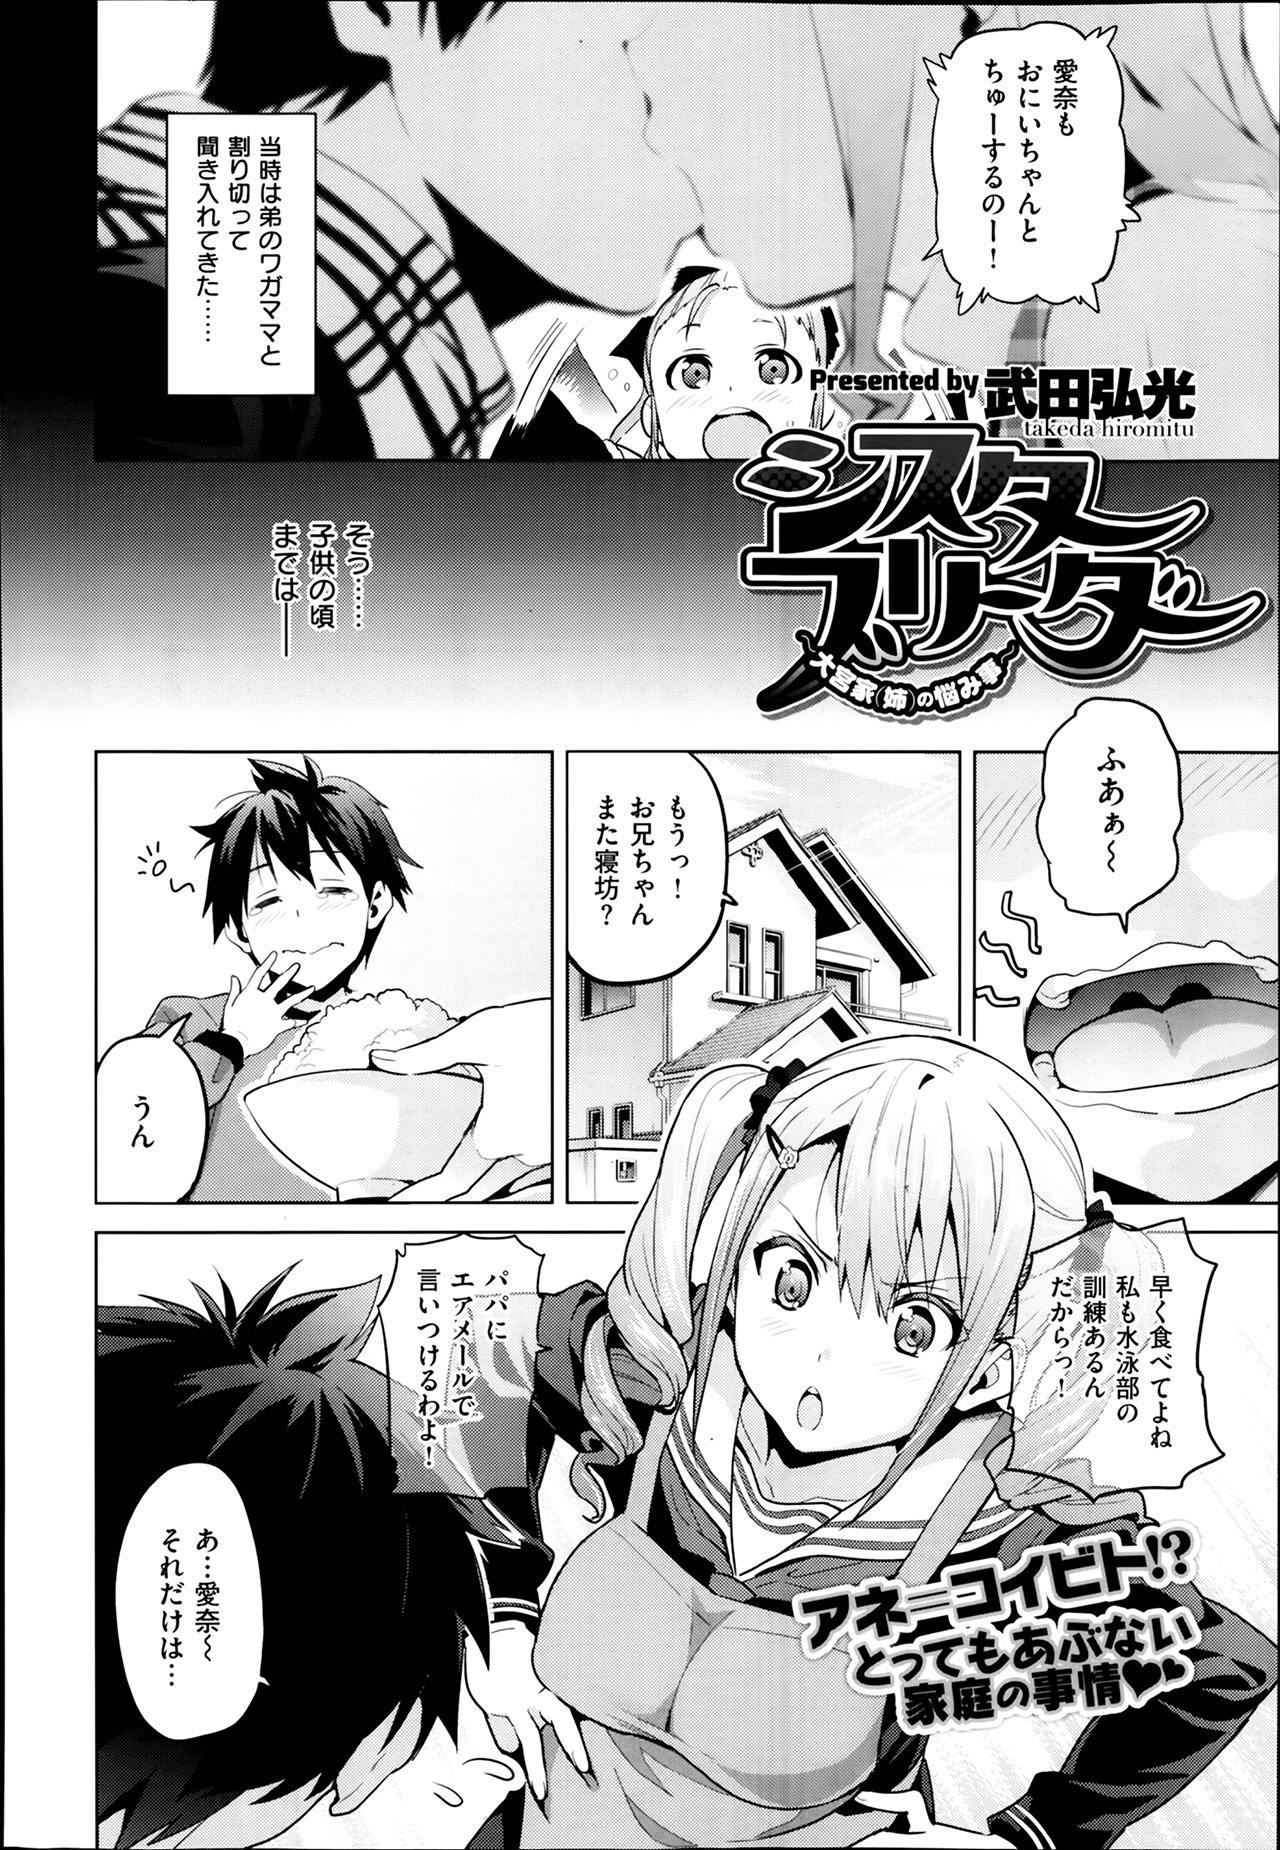 [Takeda Hiromitsu] Sister Breeder ~Oomiya-ke (Ane) no Nayami Goto~ Ch. 1-2 1